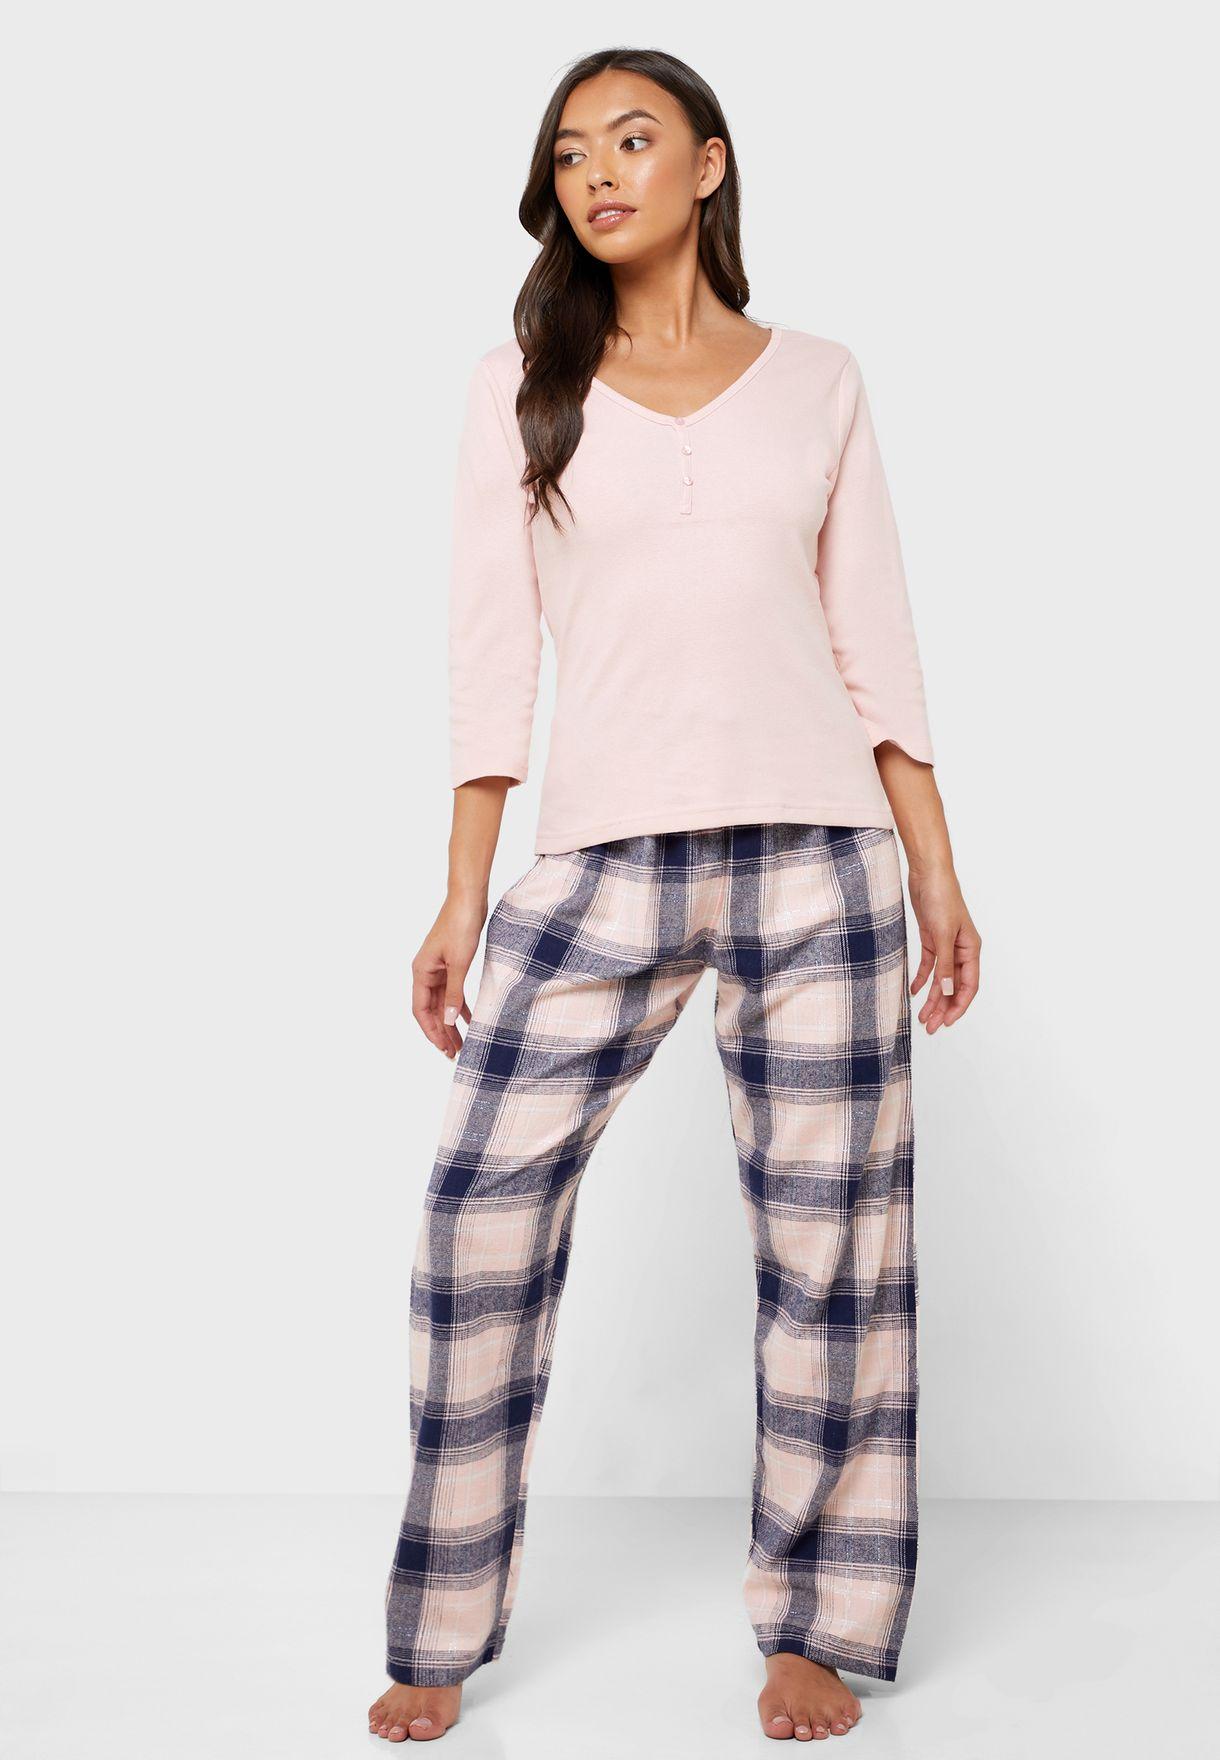 Ribbed Top & Checked Pyjama Set